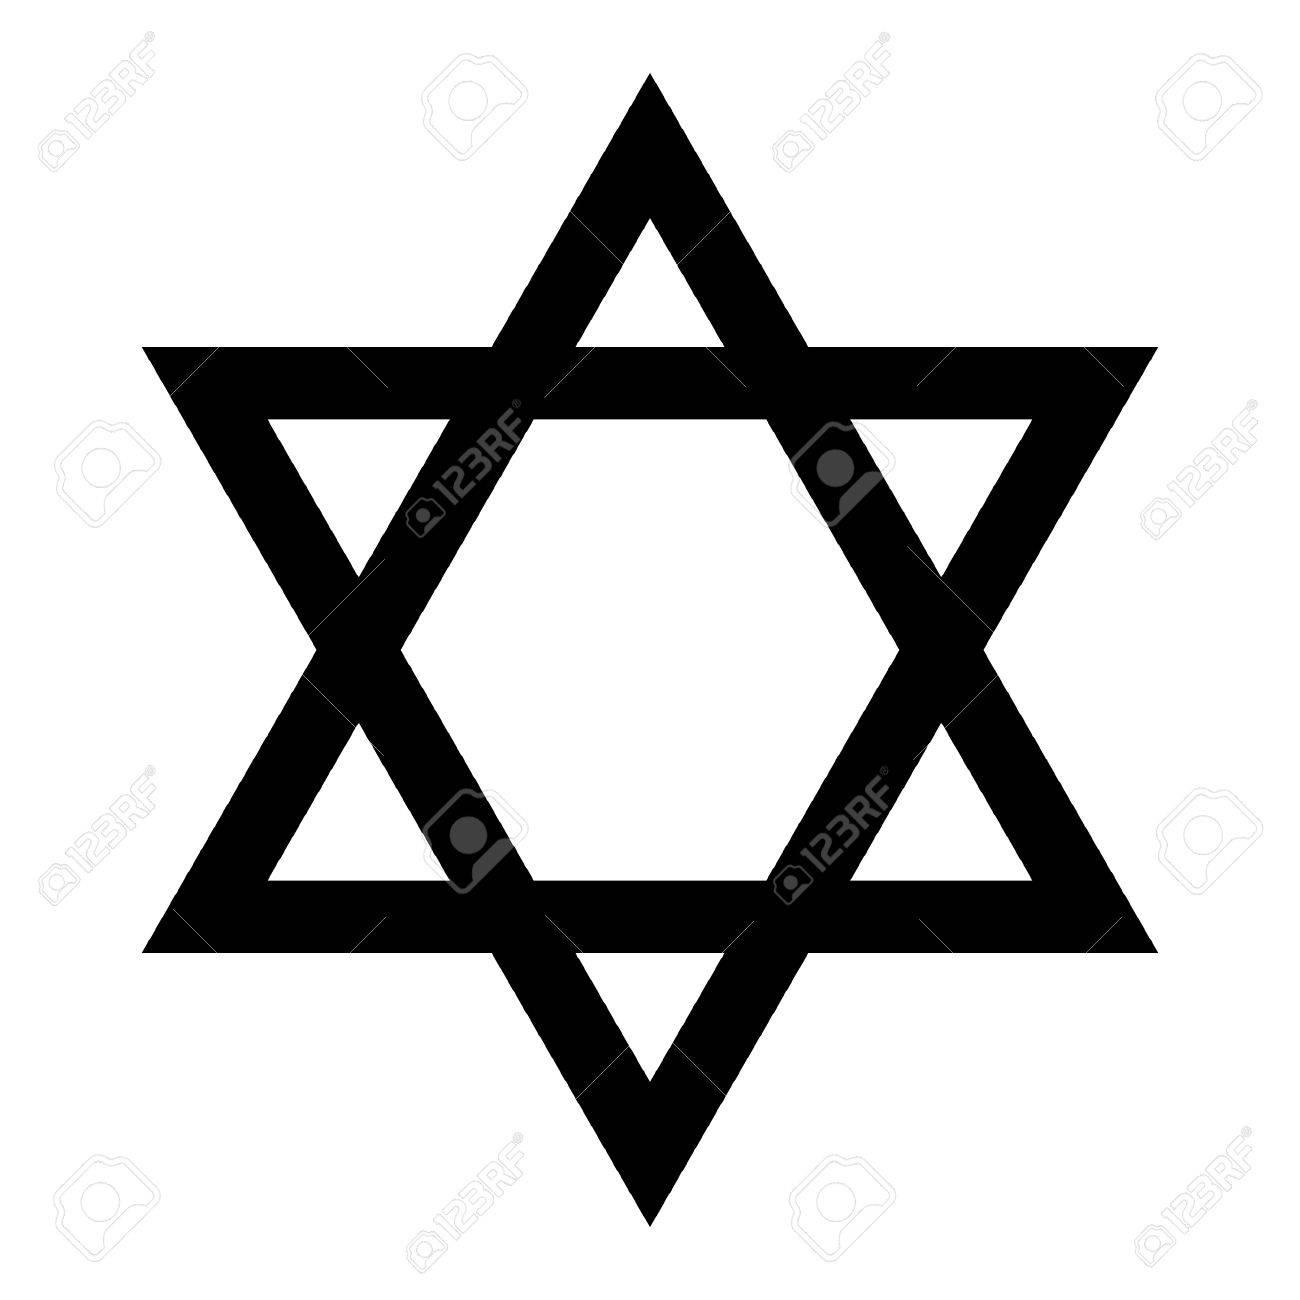 star of david symbol of israel isolated on white background rh 123rf com Purple Star Clip Art Pink Star Clip Art